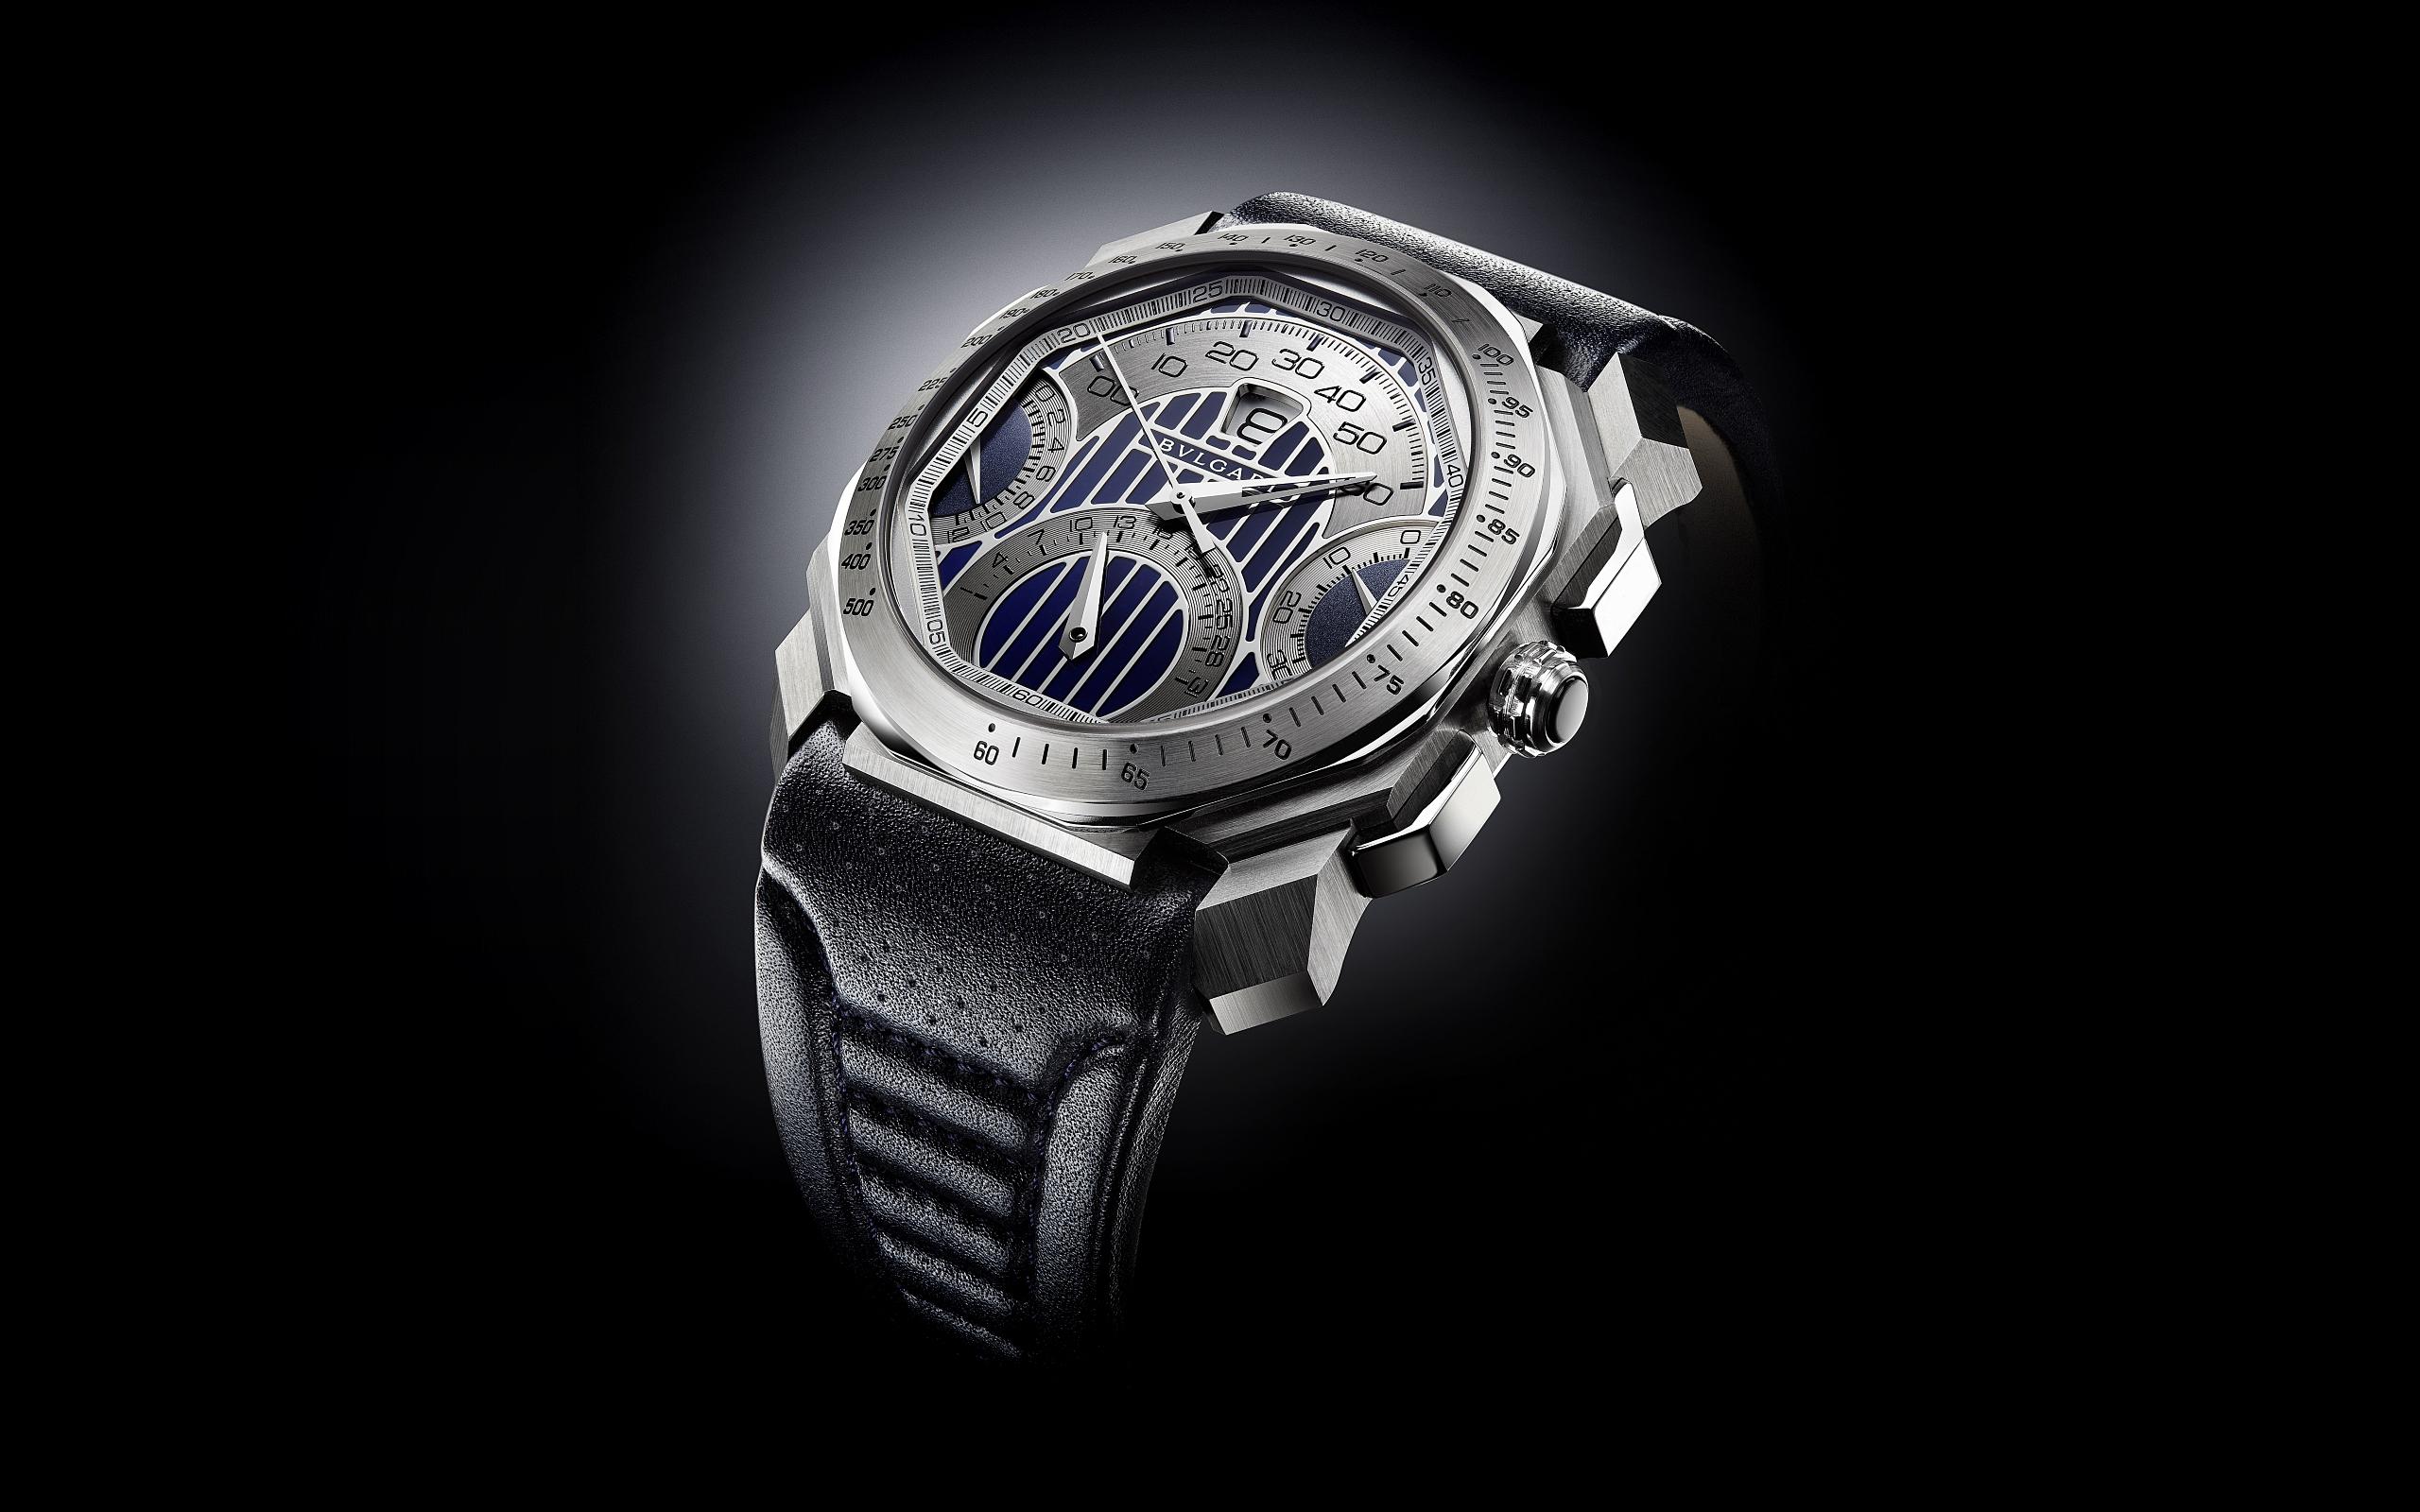 HDoboi.Kiev.ua - Часы Maserati, широкоформатные обои фон